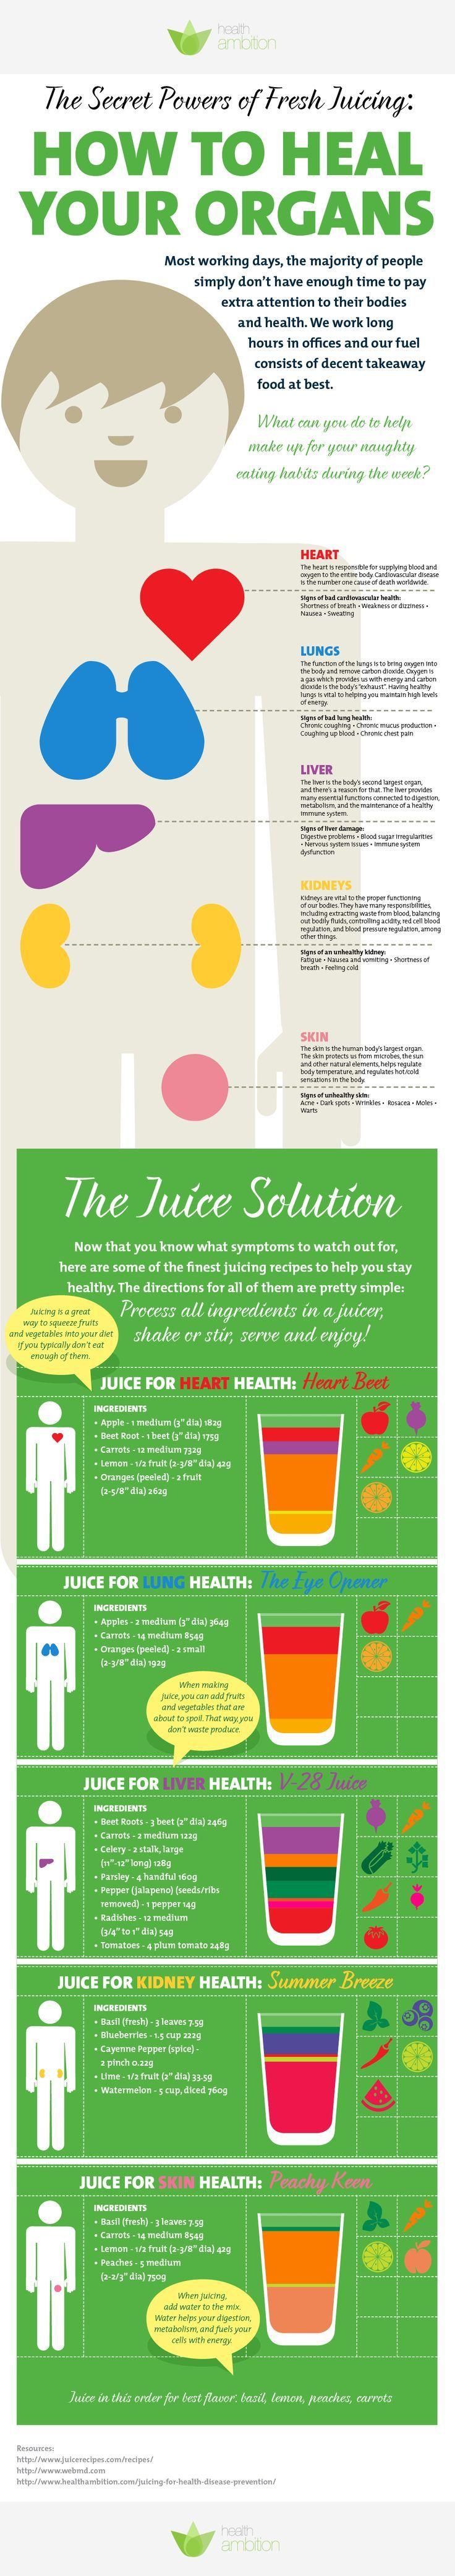 health_ambition_juice_IG